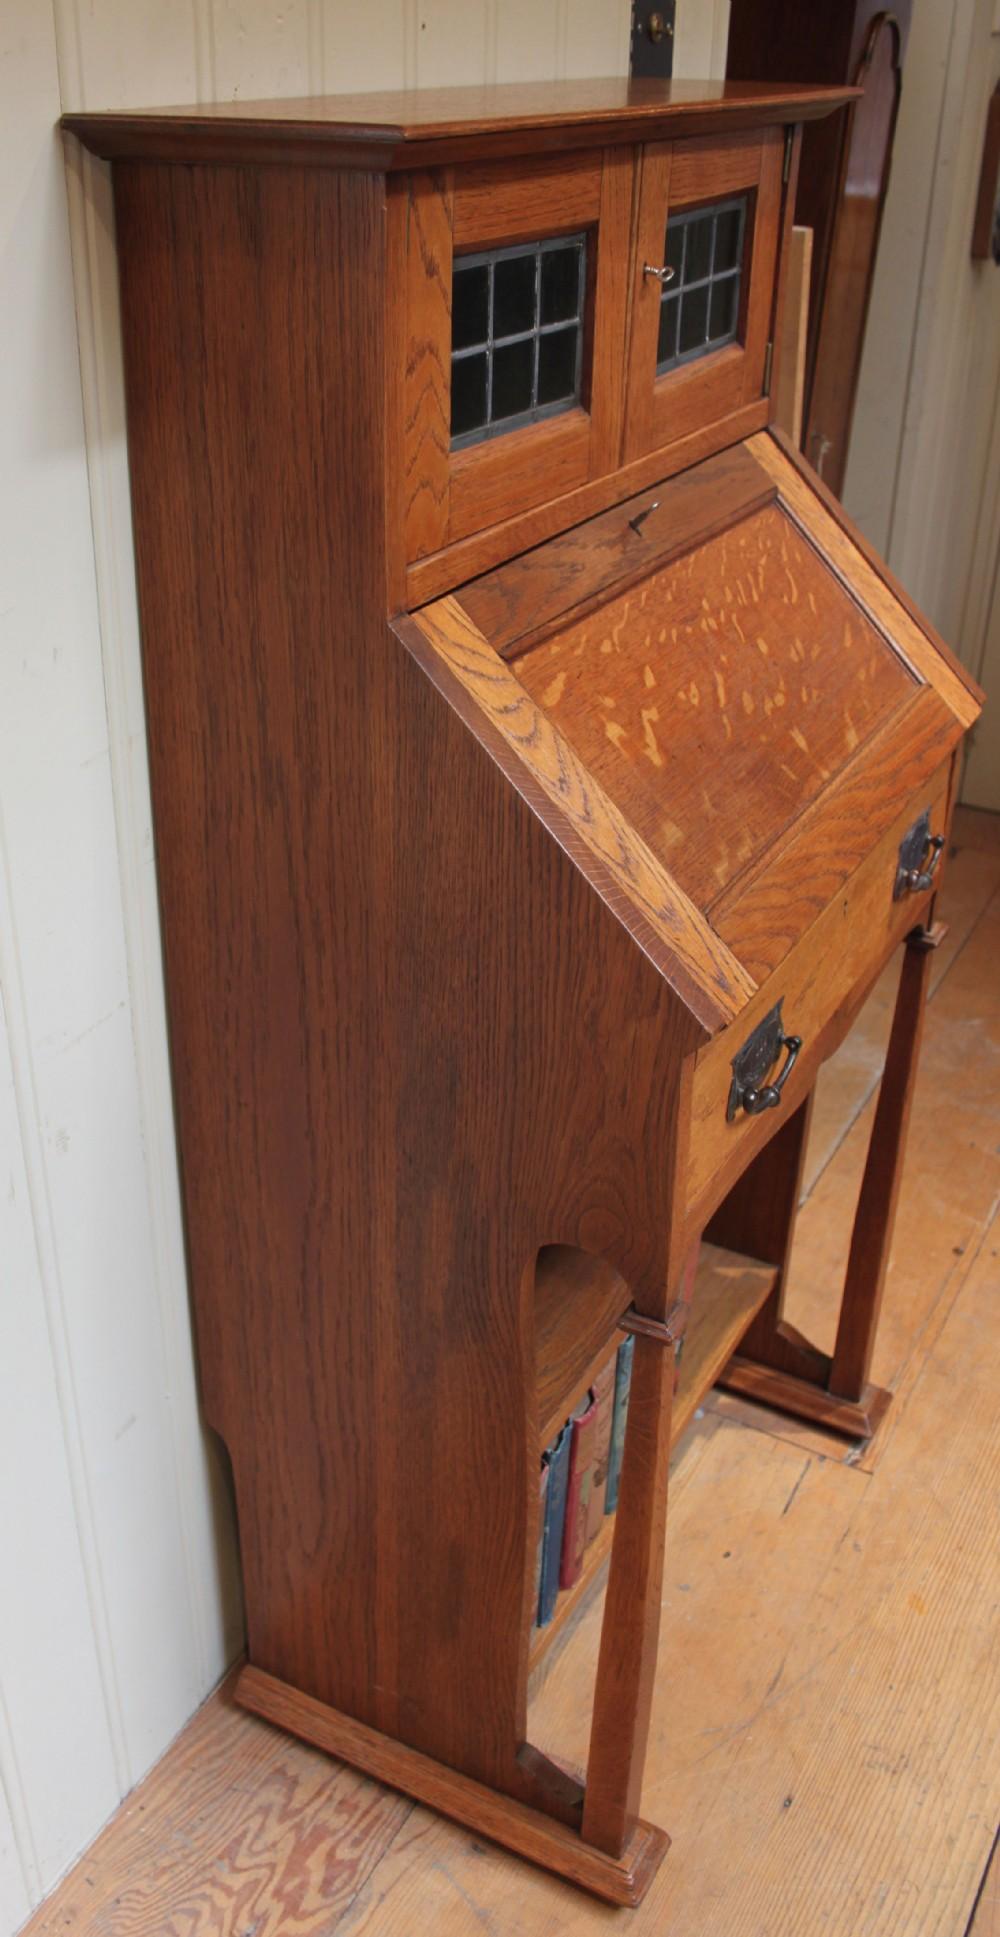 Arts and crafts bureau - Small Light Oak Arts And Crafts Oak Bureau Bookcase England C 1900 296110 Sellingantiques Co Uk